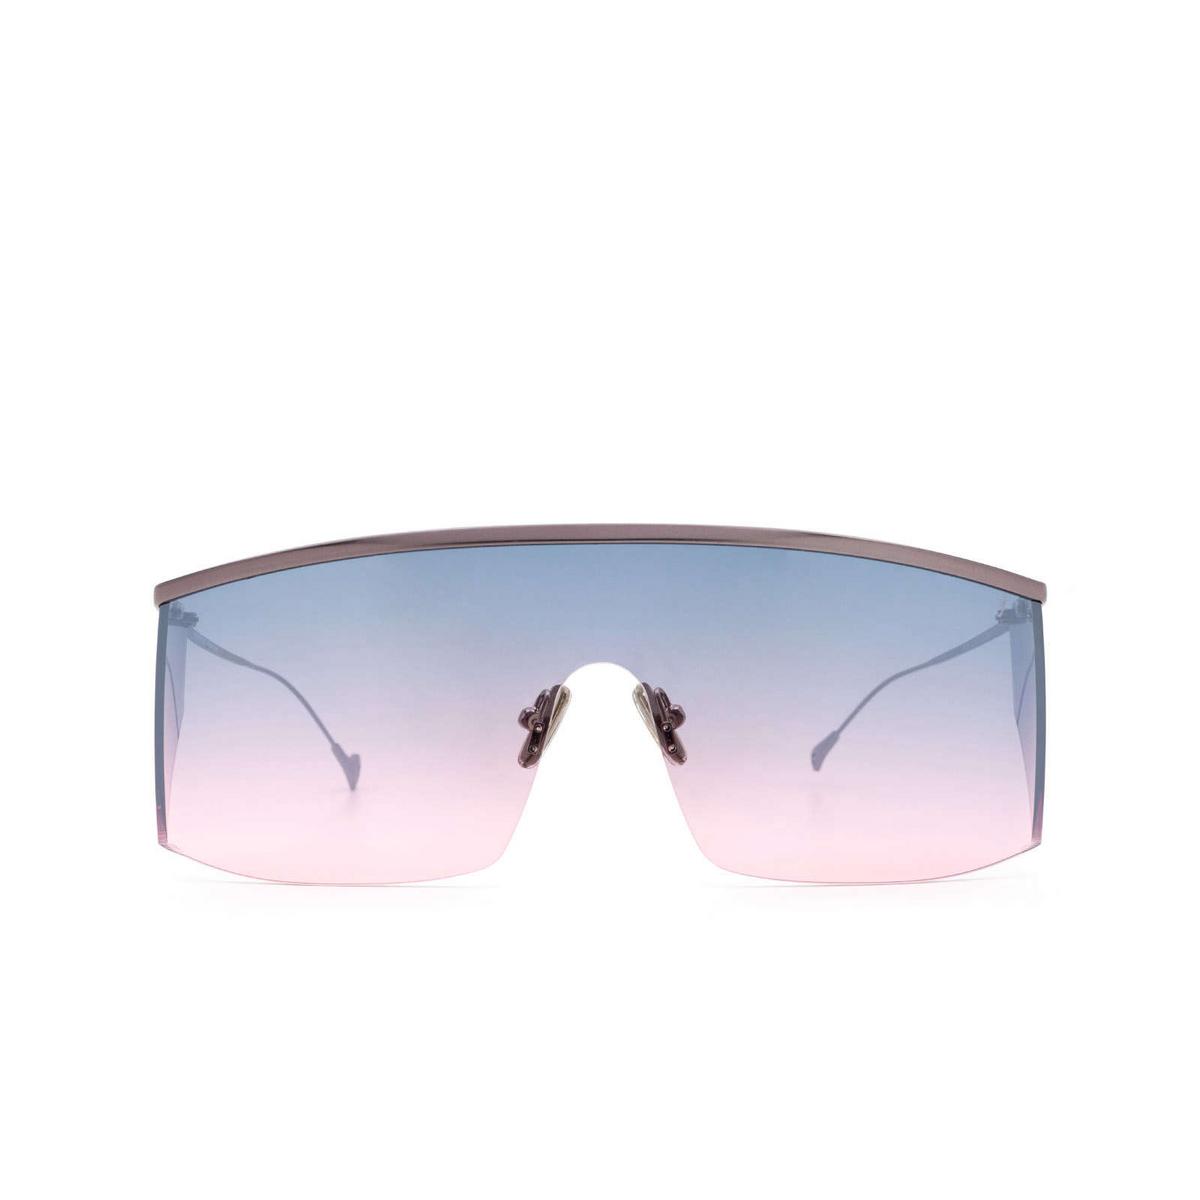 Eyepetizer® Mask Sunglasses: Karl color Gunmetal C.3-20F - front view.